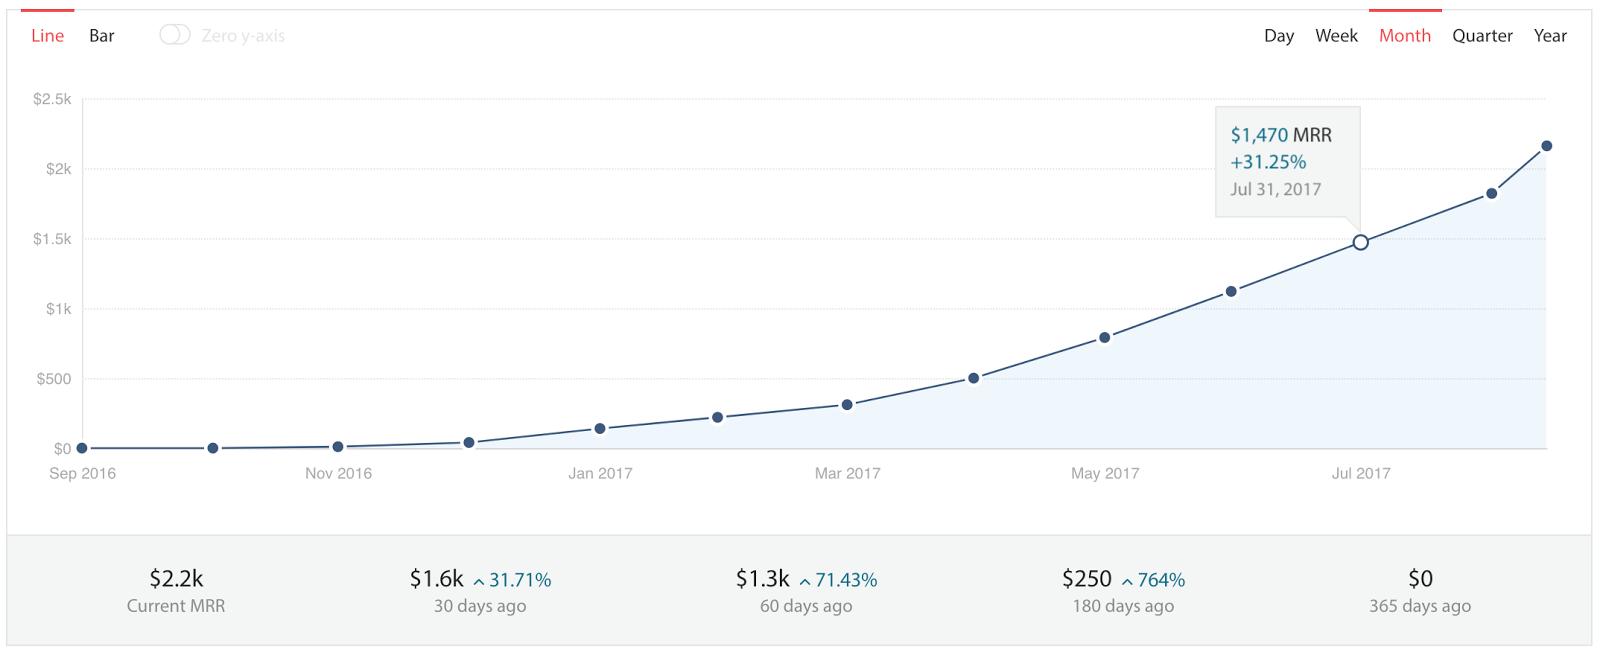 24-29% MRR growth